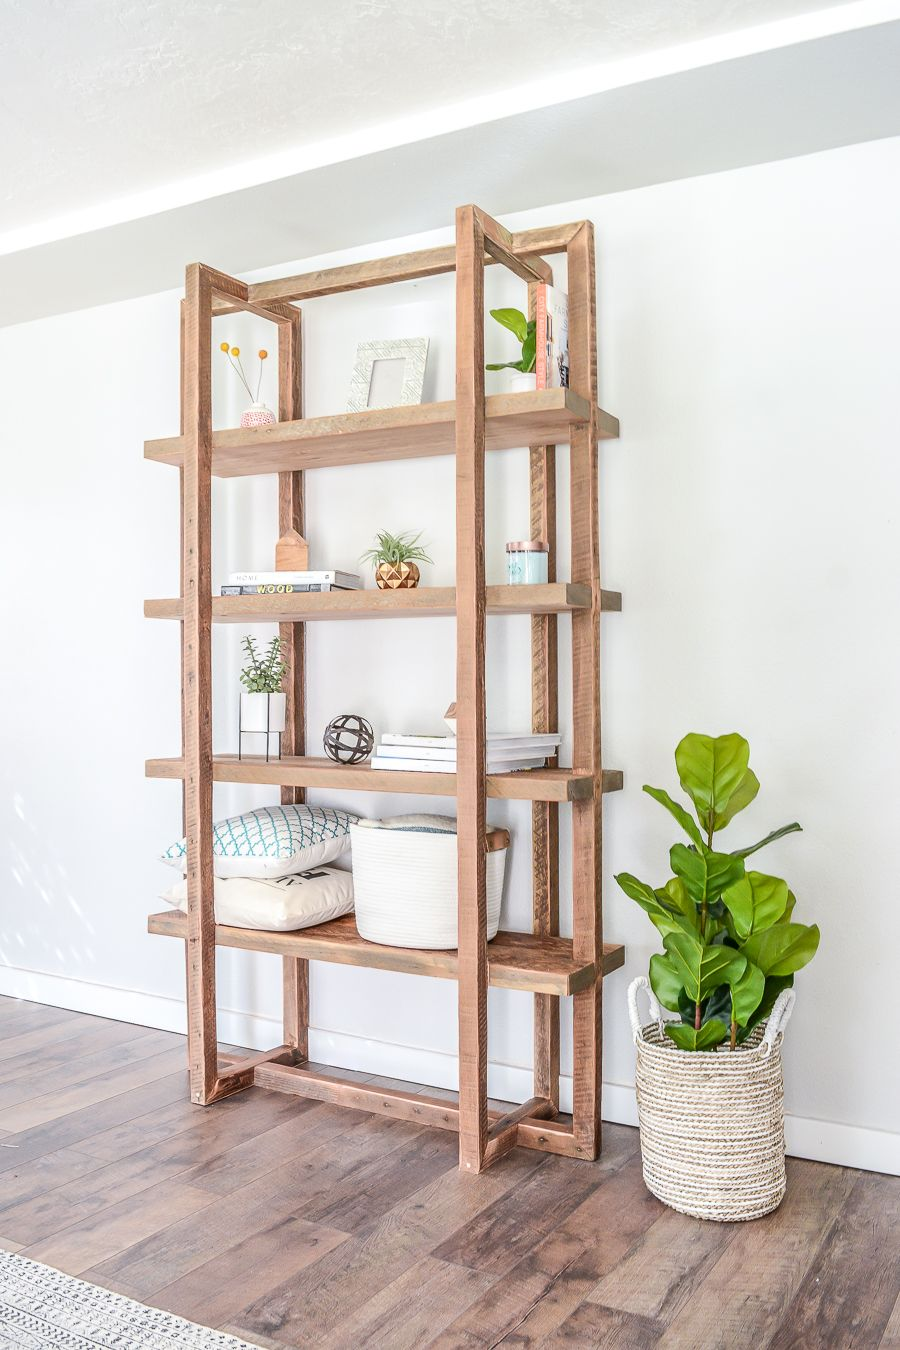 Diy Geometric Bookshelf Diy Bookshelf Plans Diy Furniture Plans Diy Furniture